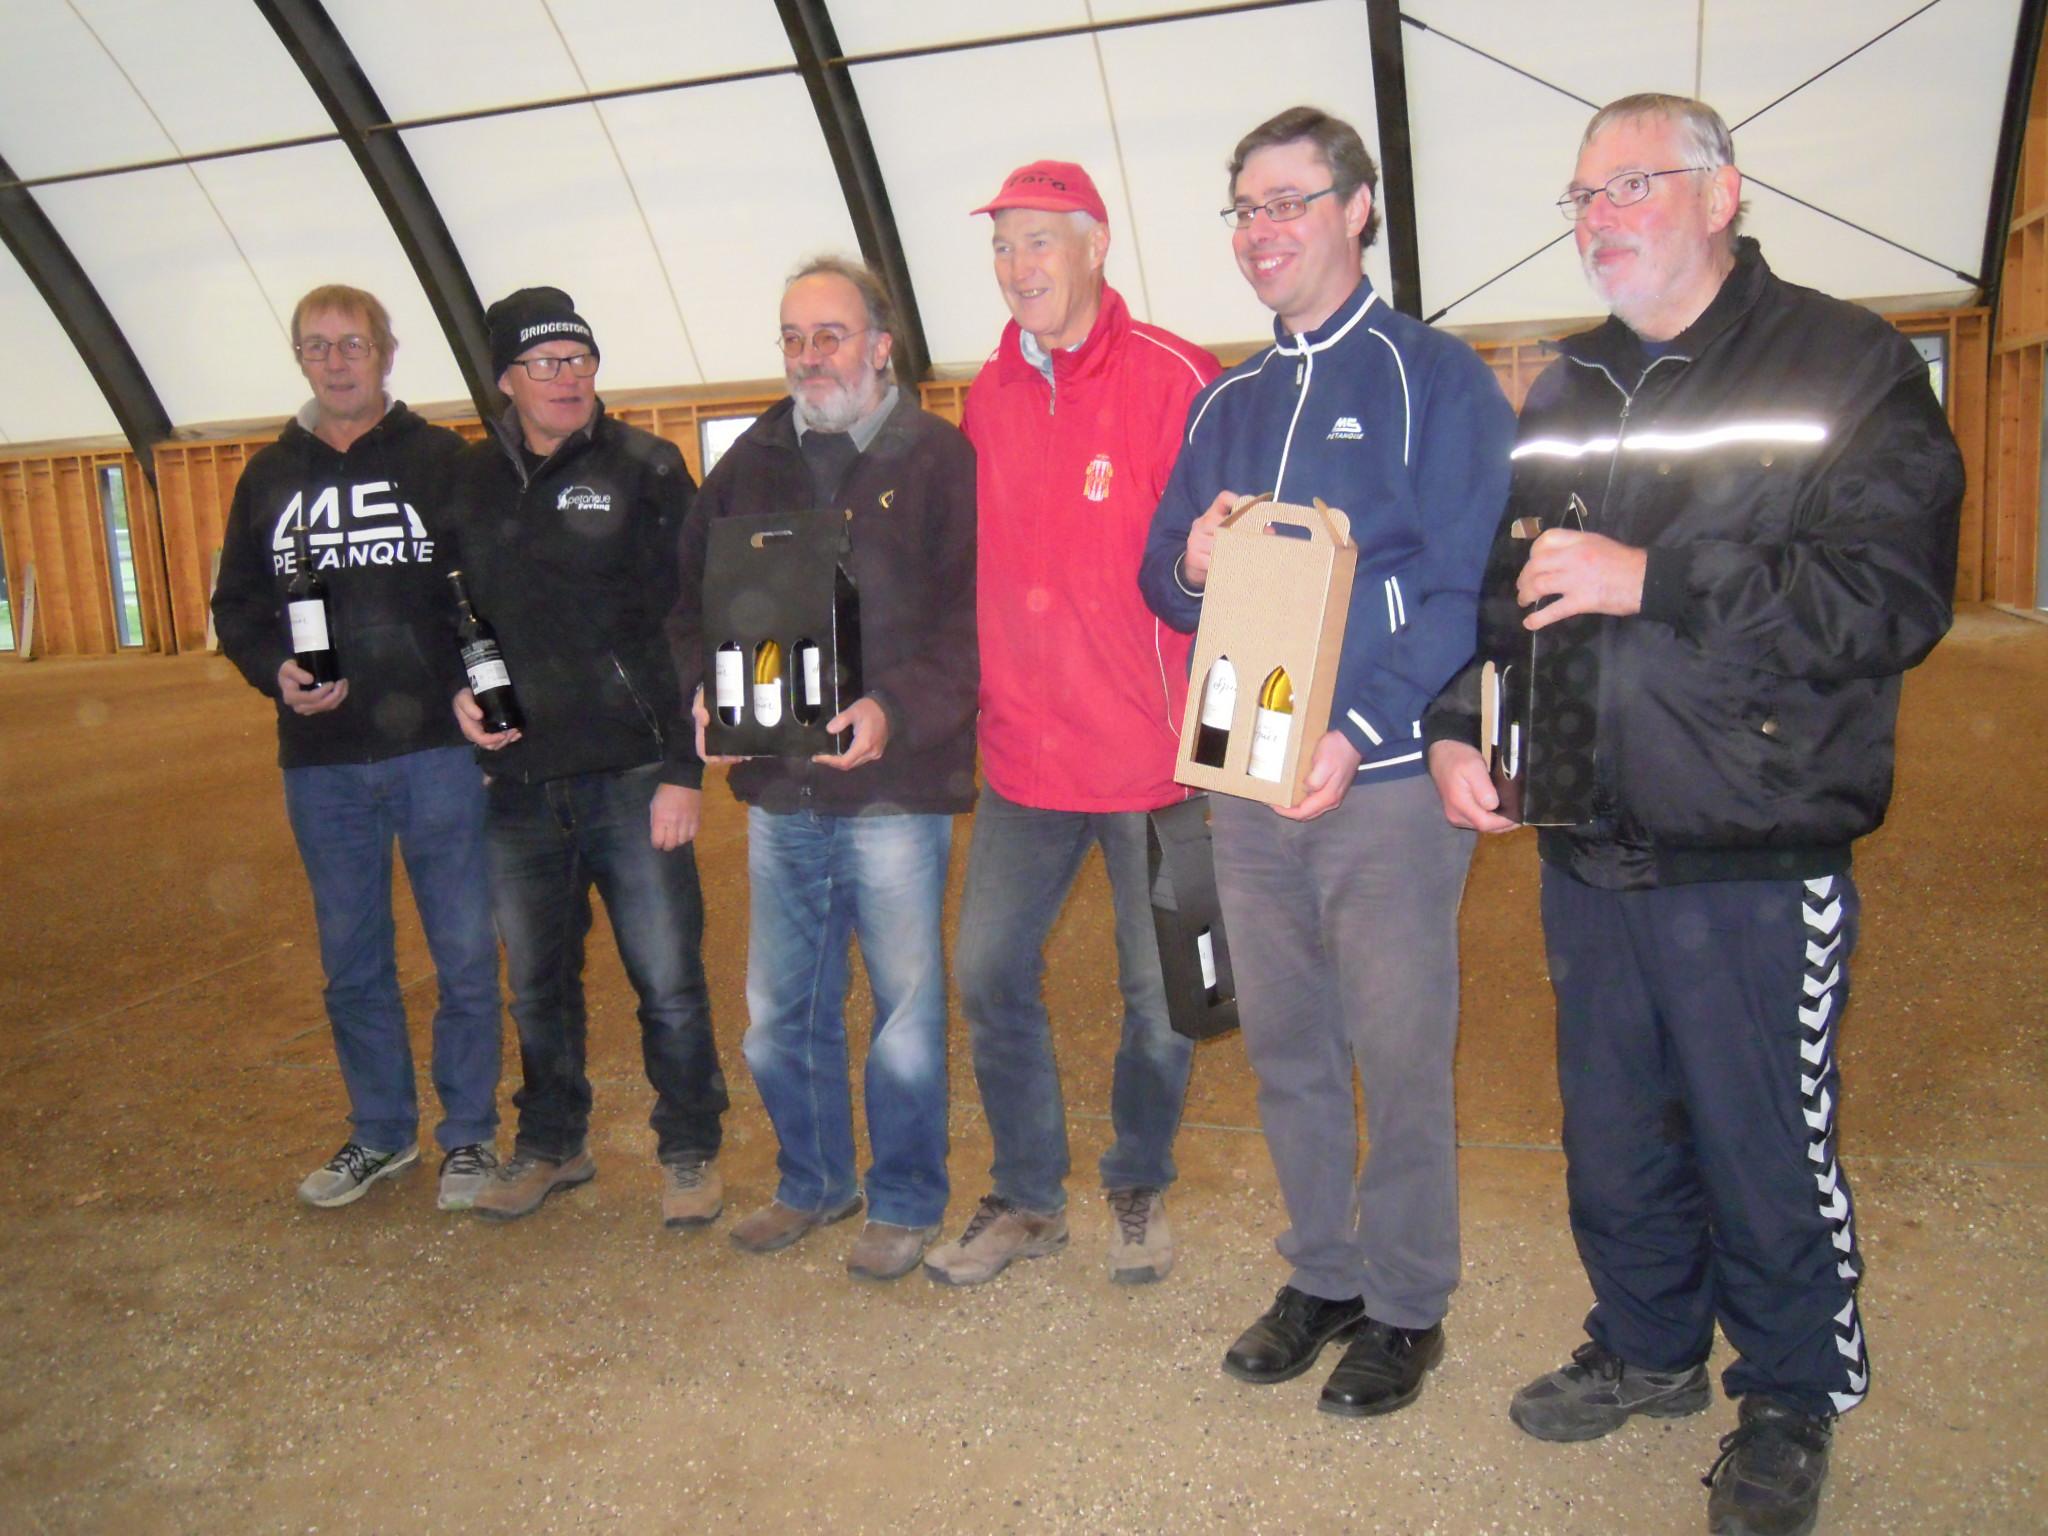 nr. 3Kim Frost og Claus Kùlmbach,nr.1 Pierre Tassone OPK og Torben Vous Bradbrand, nr. 2 Philip og Henrik Malmos Faldsled,Svanninge